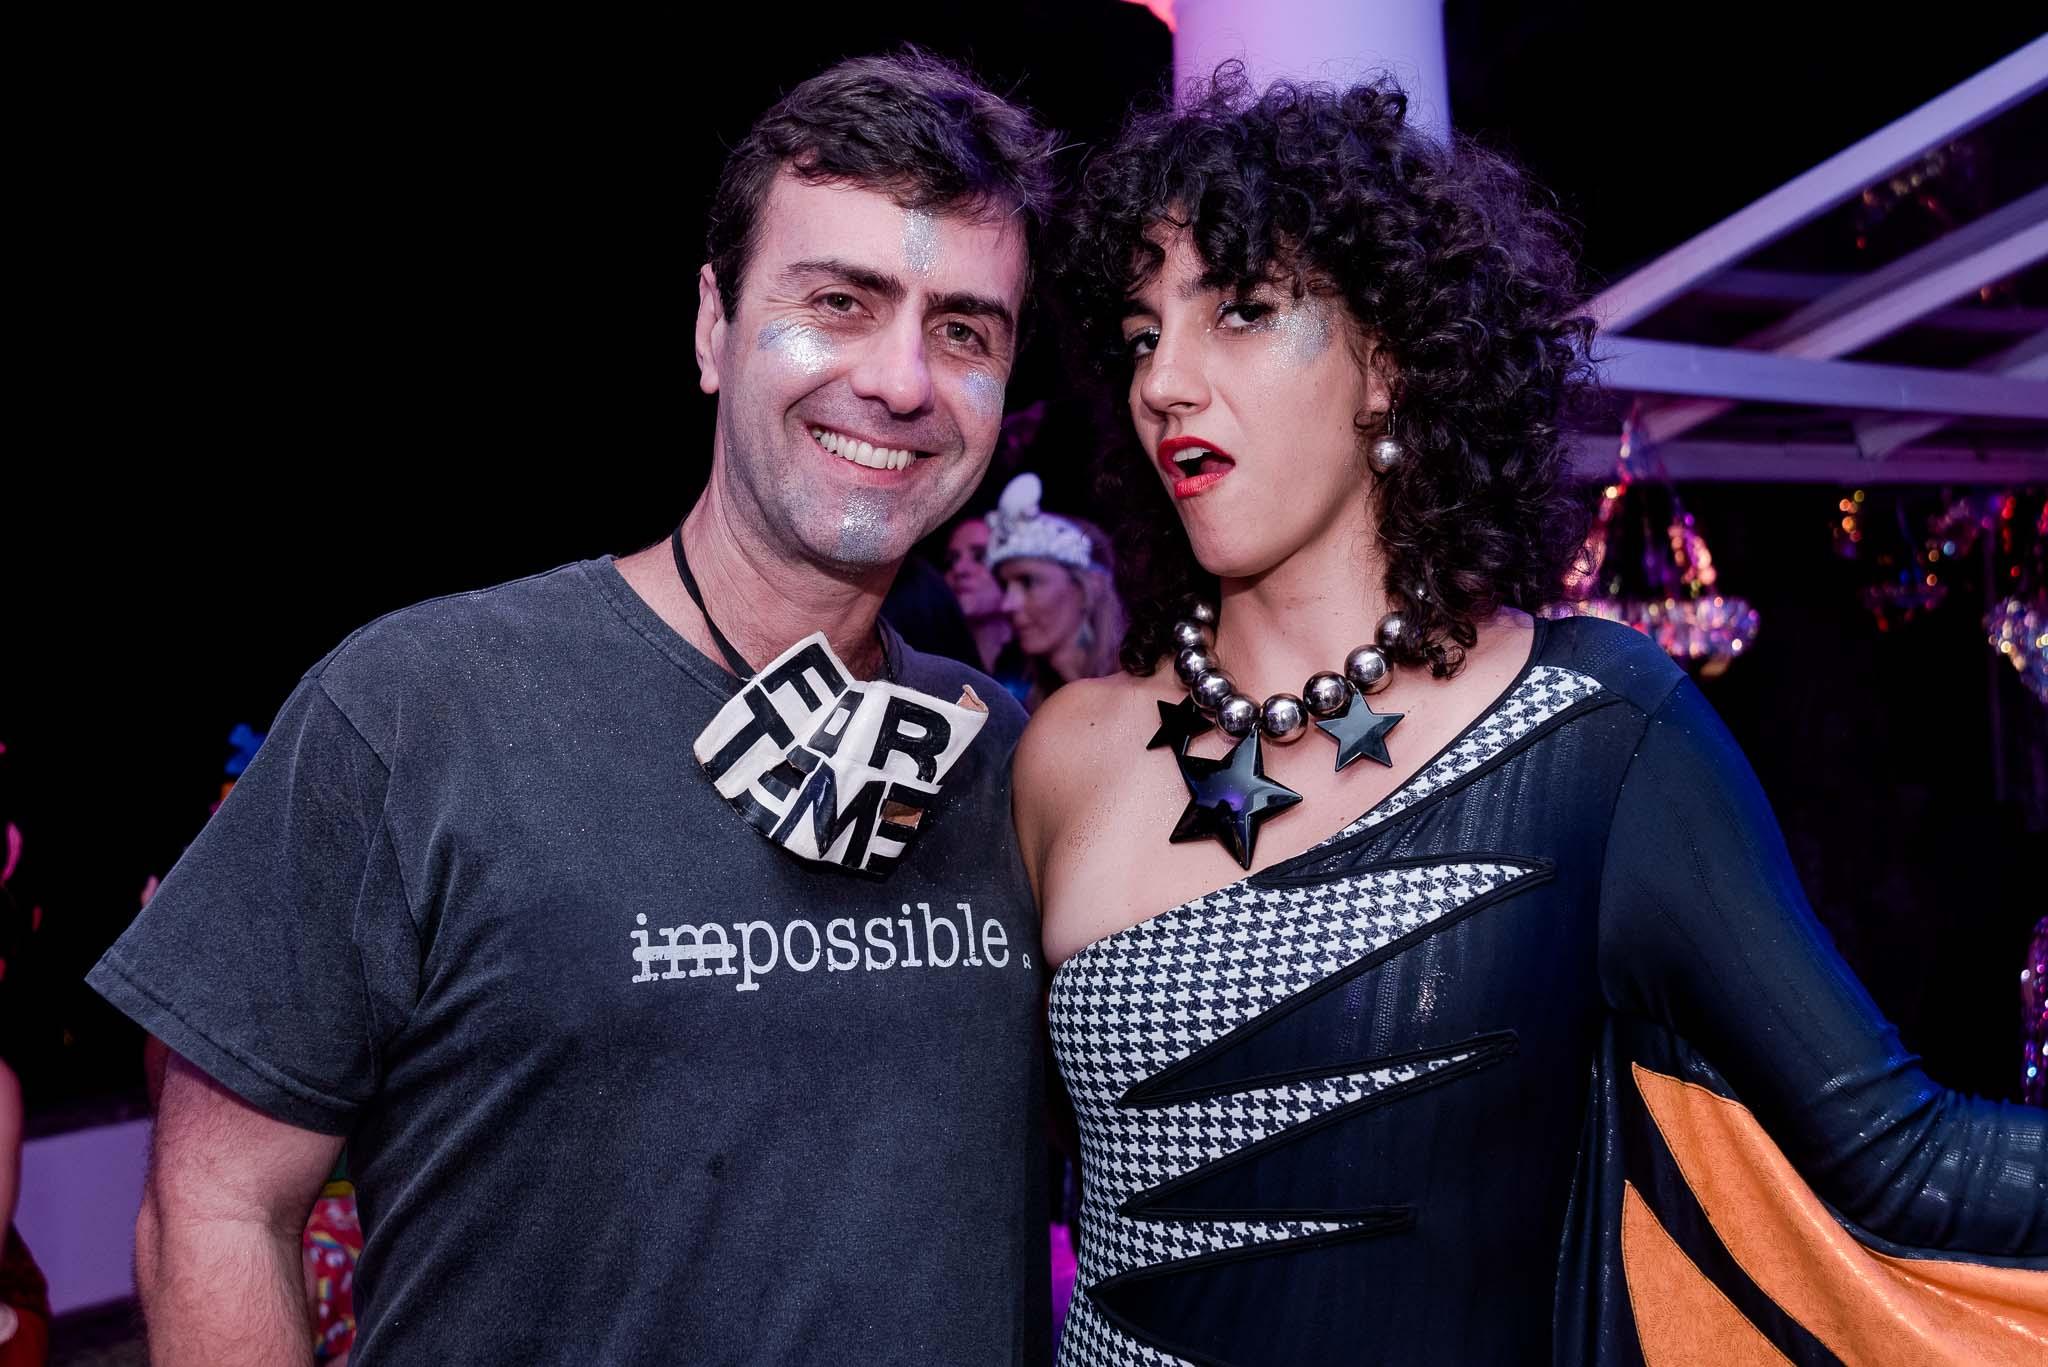 Marcelo Freixo e Antonia Pelegrino